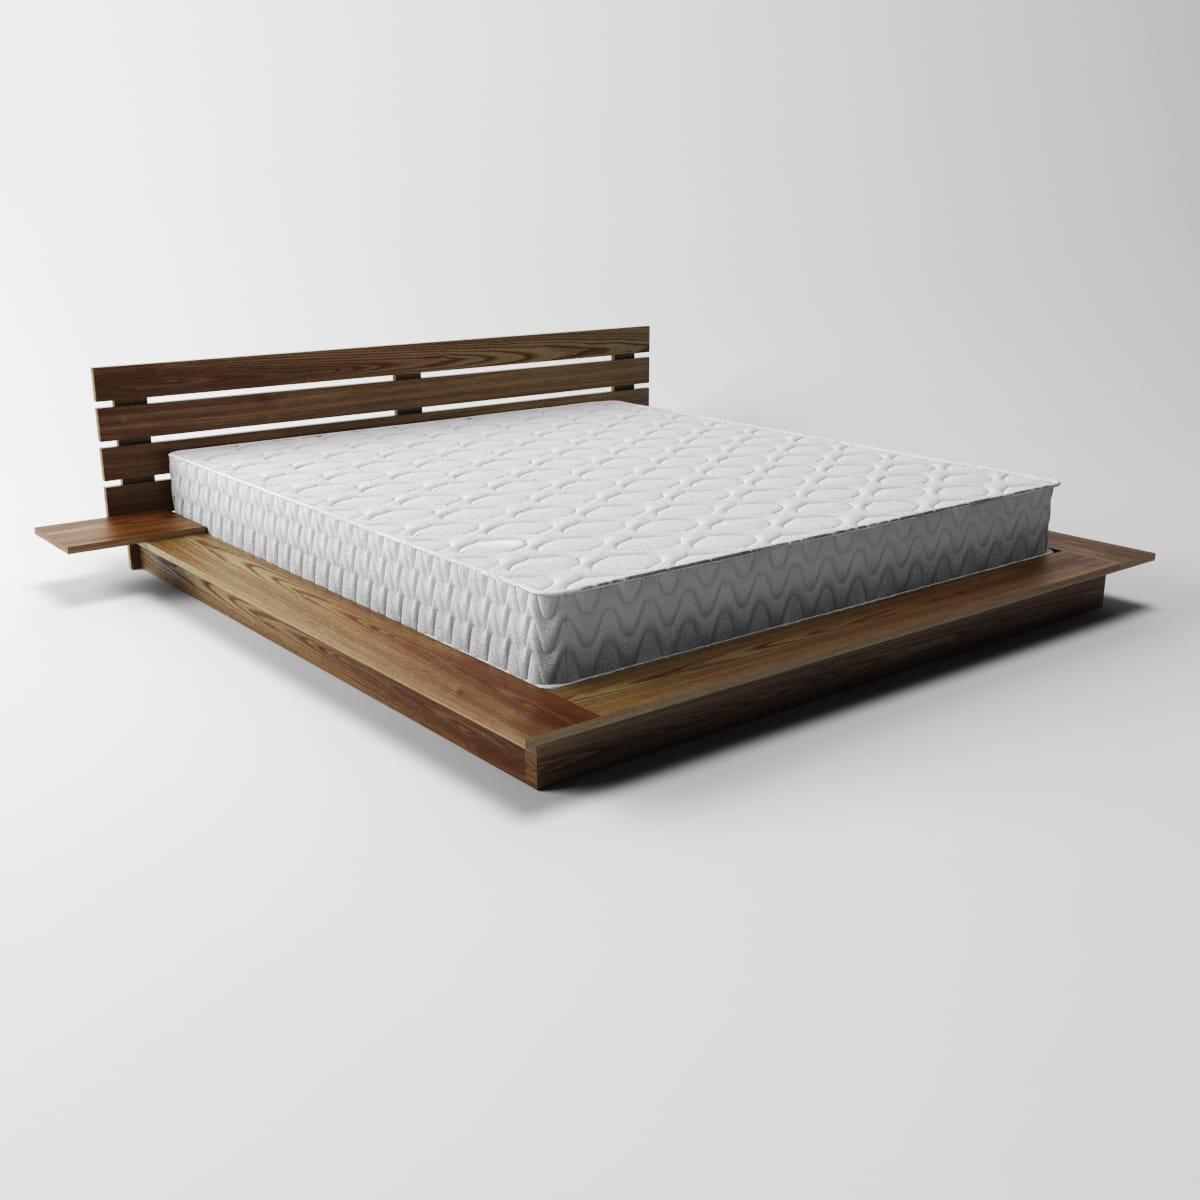 Ліжко дерев'яне полуторне Акко (масив ясеня)